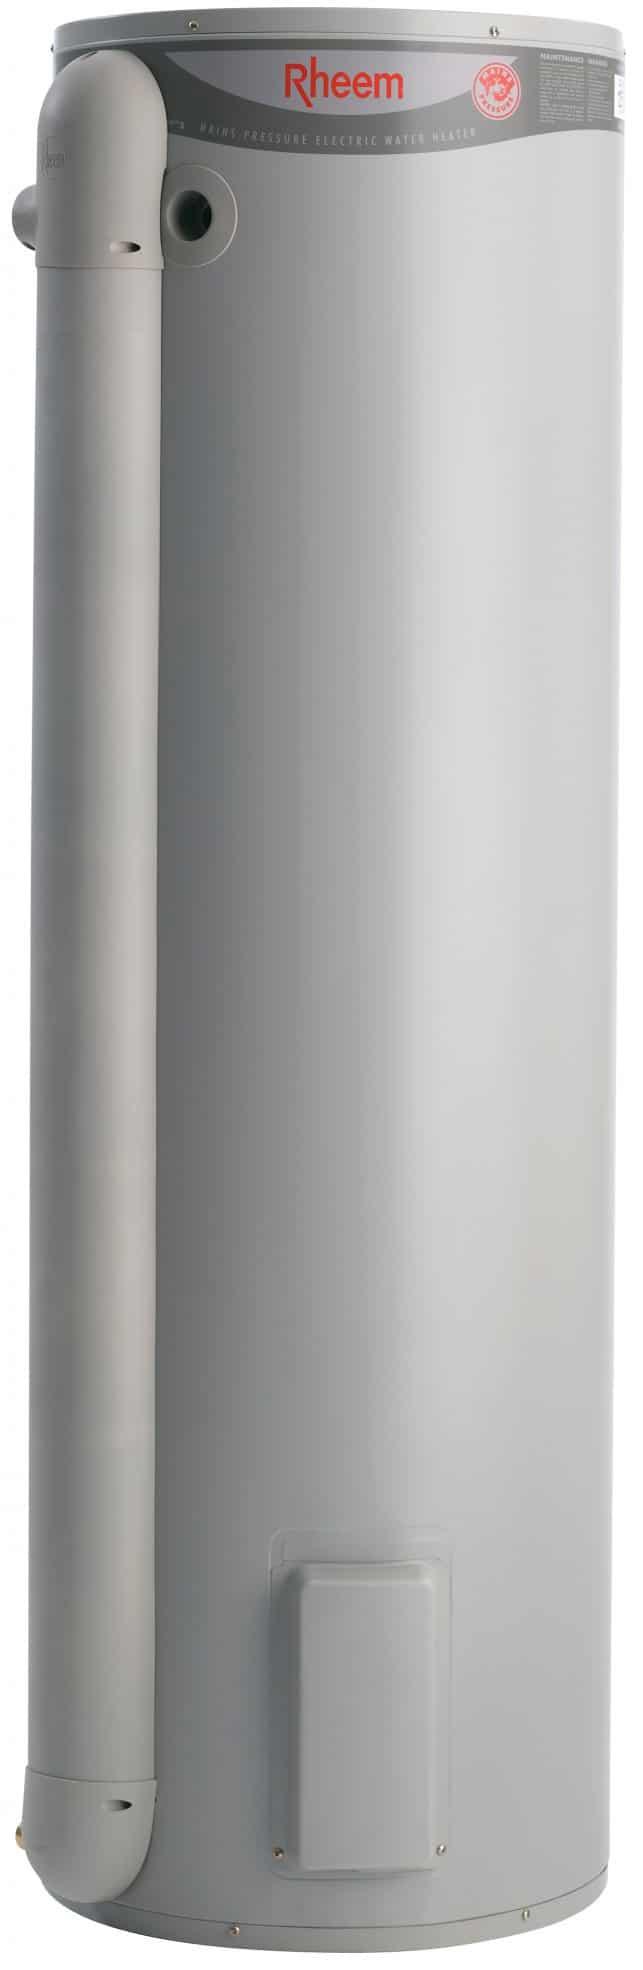 RheemPlus Electric Storage Hot Water